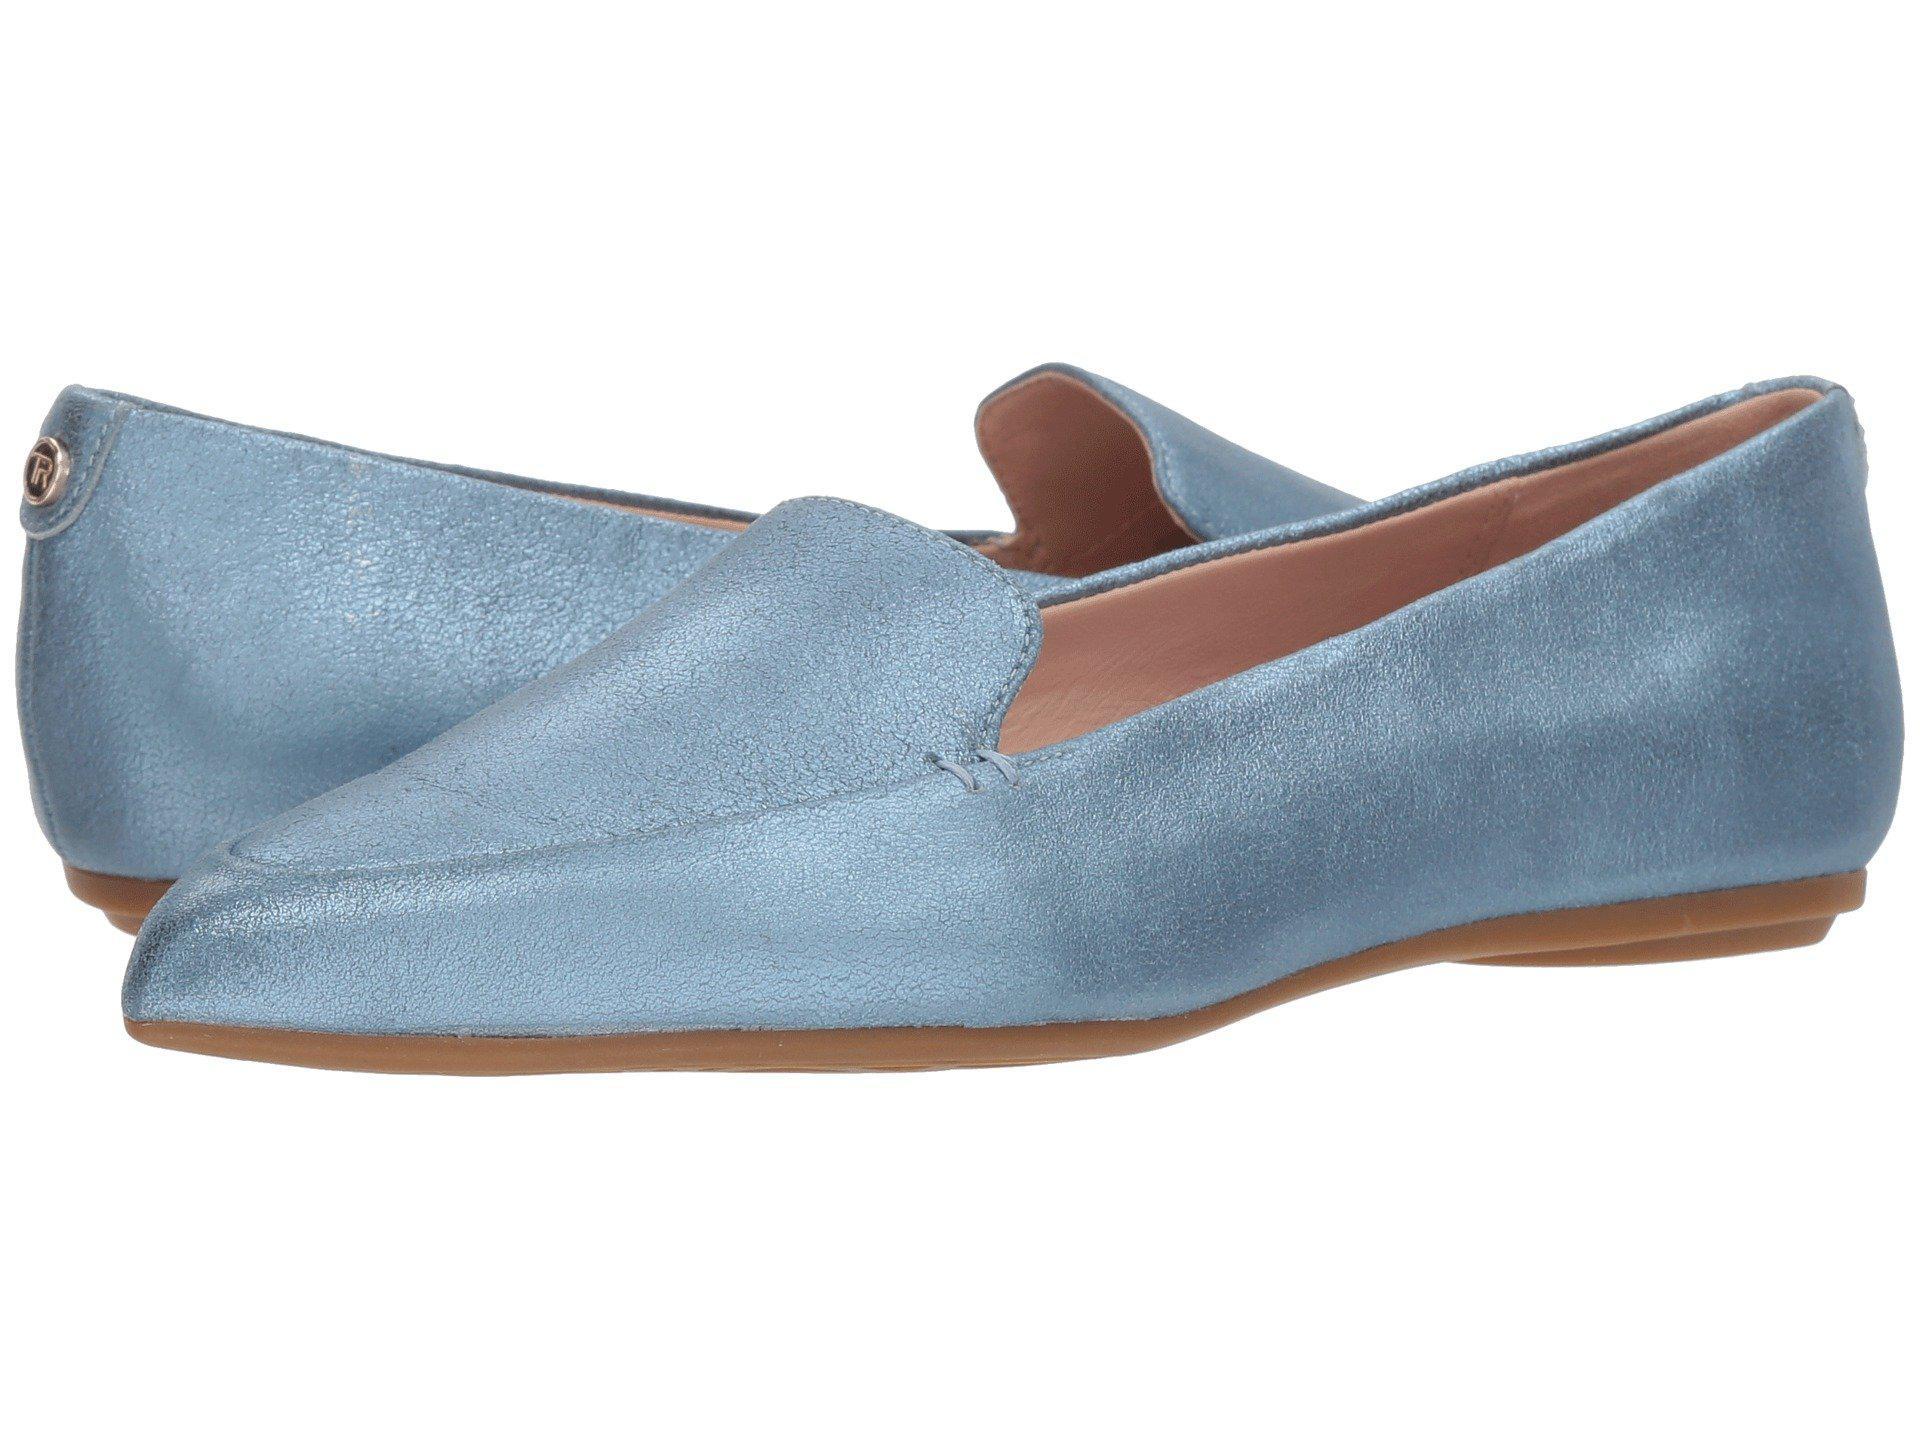 63b64fba162 Lyst - Taryn Rose Faye in Blue - Save 50%